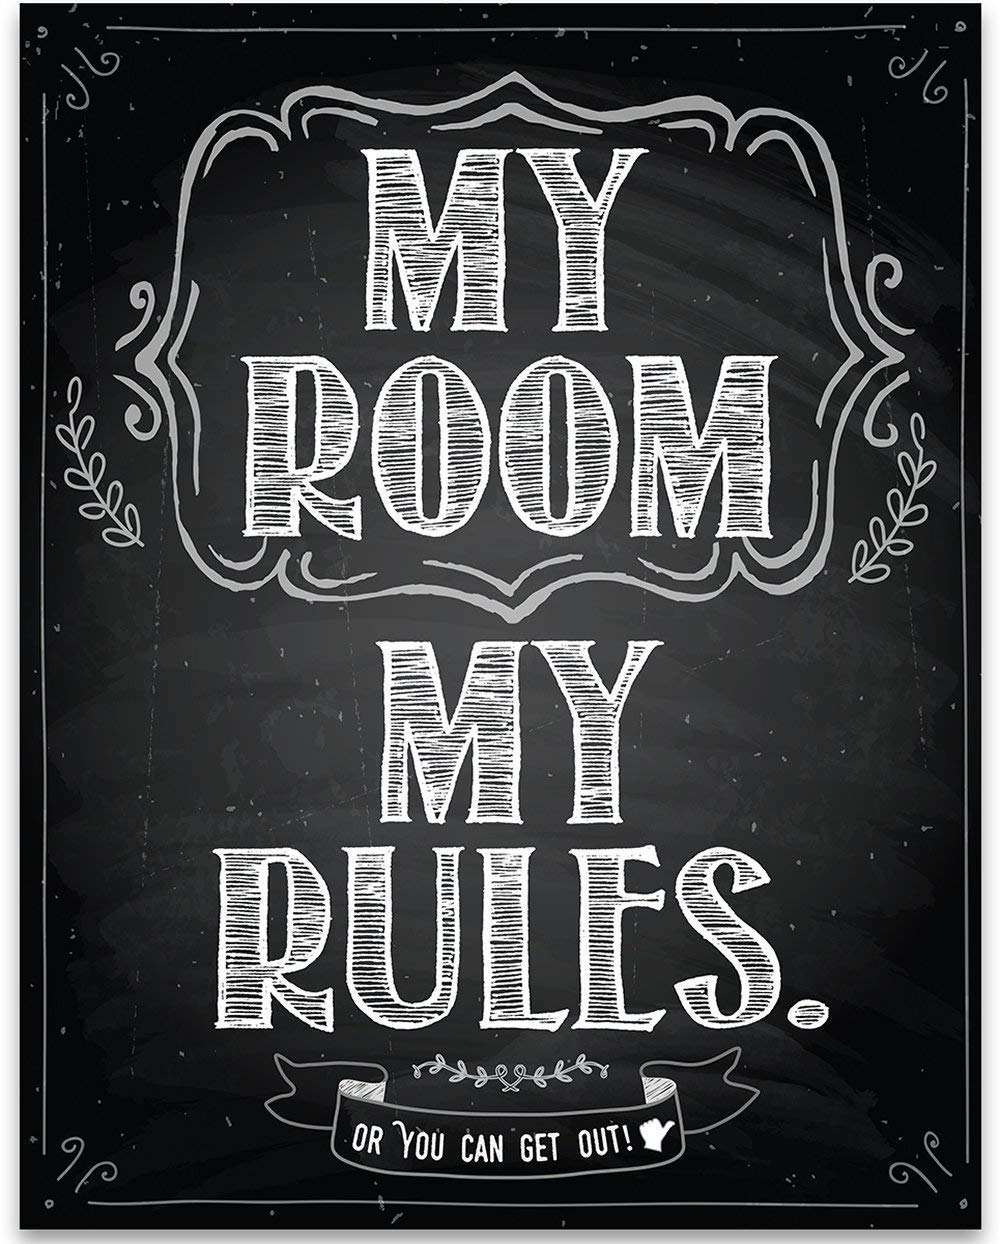 Amazon Com My Room My Rules 11x14 Unframed Cool Art Print Cute Decor For Teen Room Stuff For Dorm Rooms Cheap Gift Under 15 Handmade